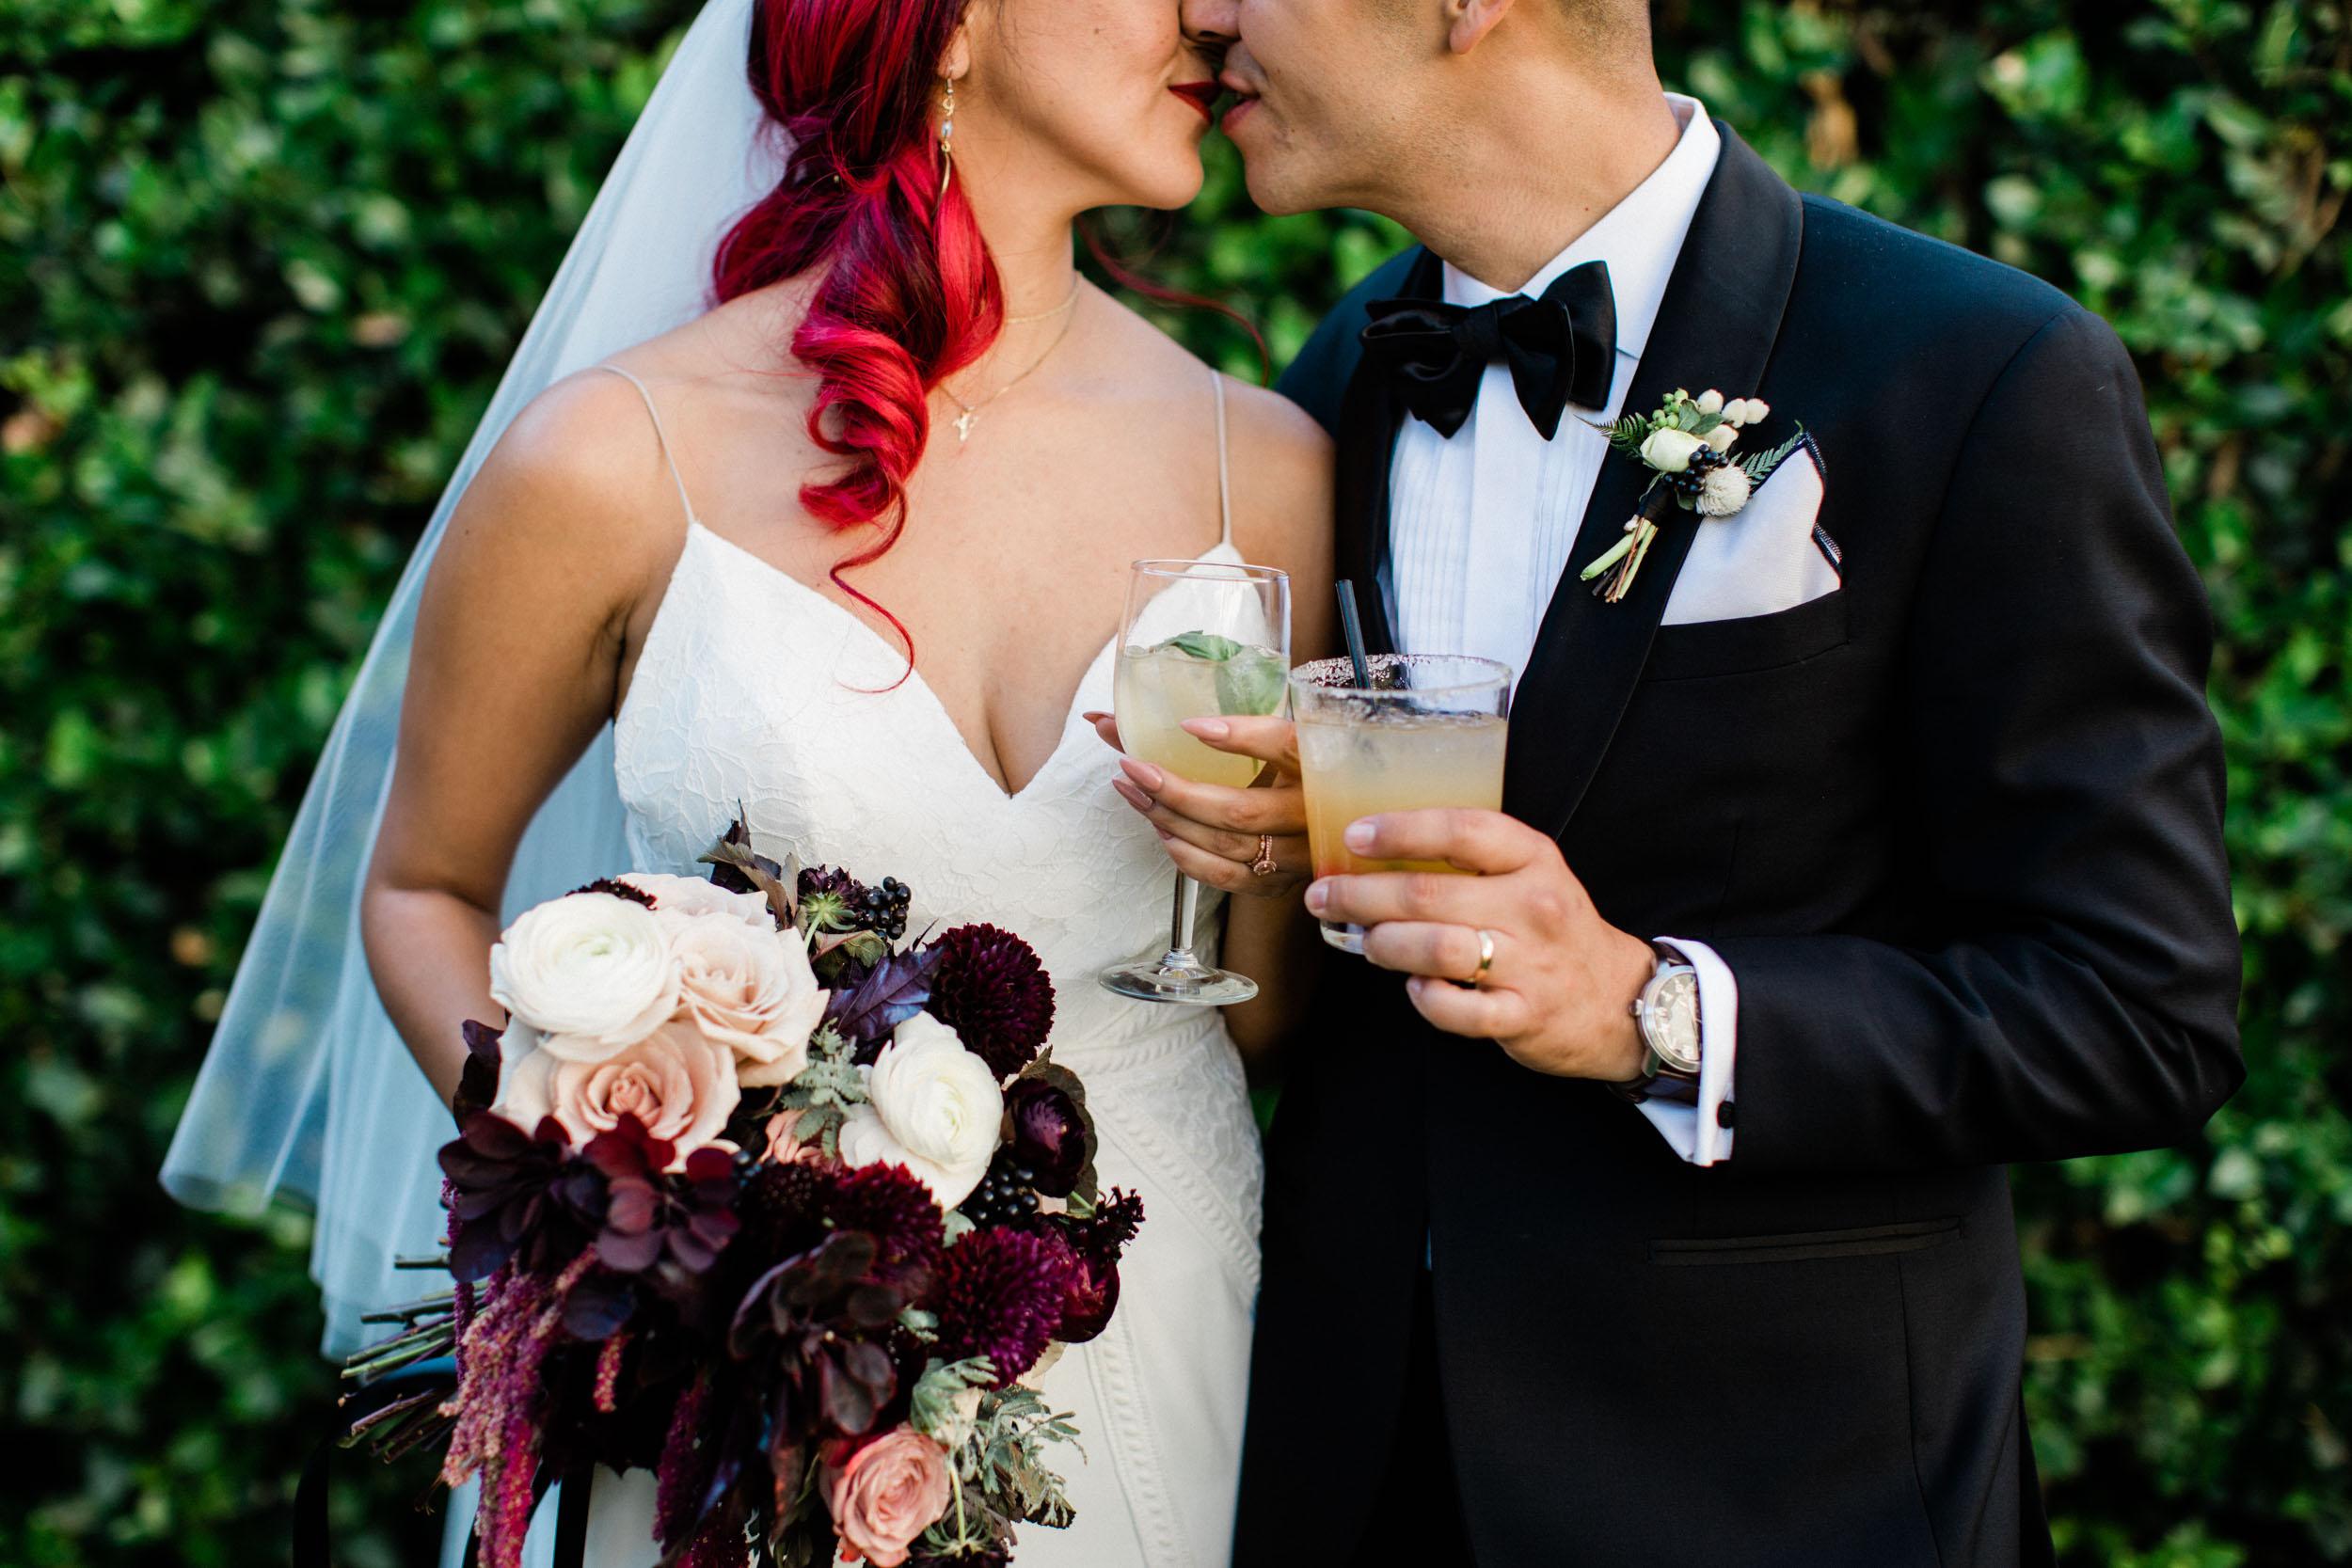 BKM-Photography-Los-Angeles-Highland-Park-York-Manor-Wedding-Photography-0826.jpg